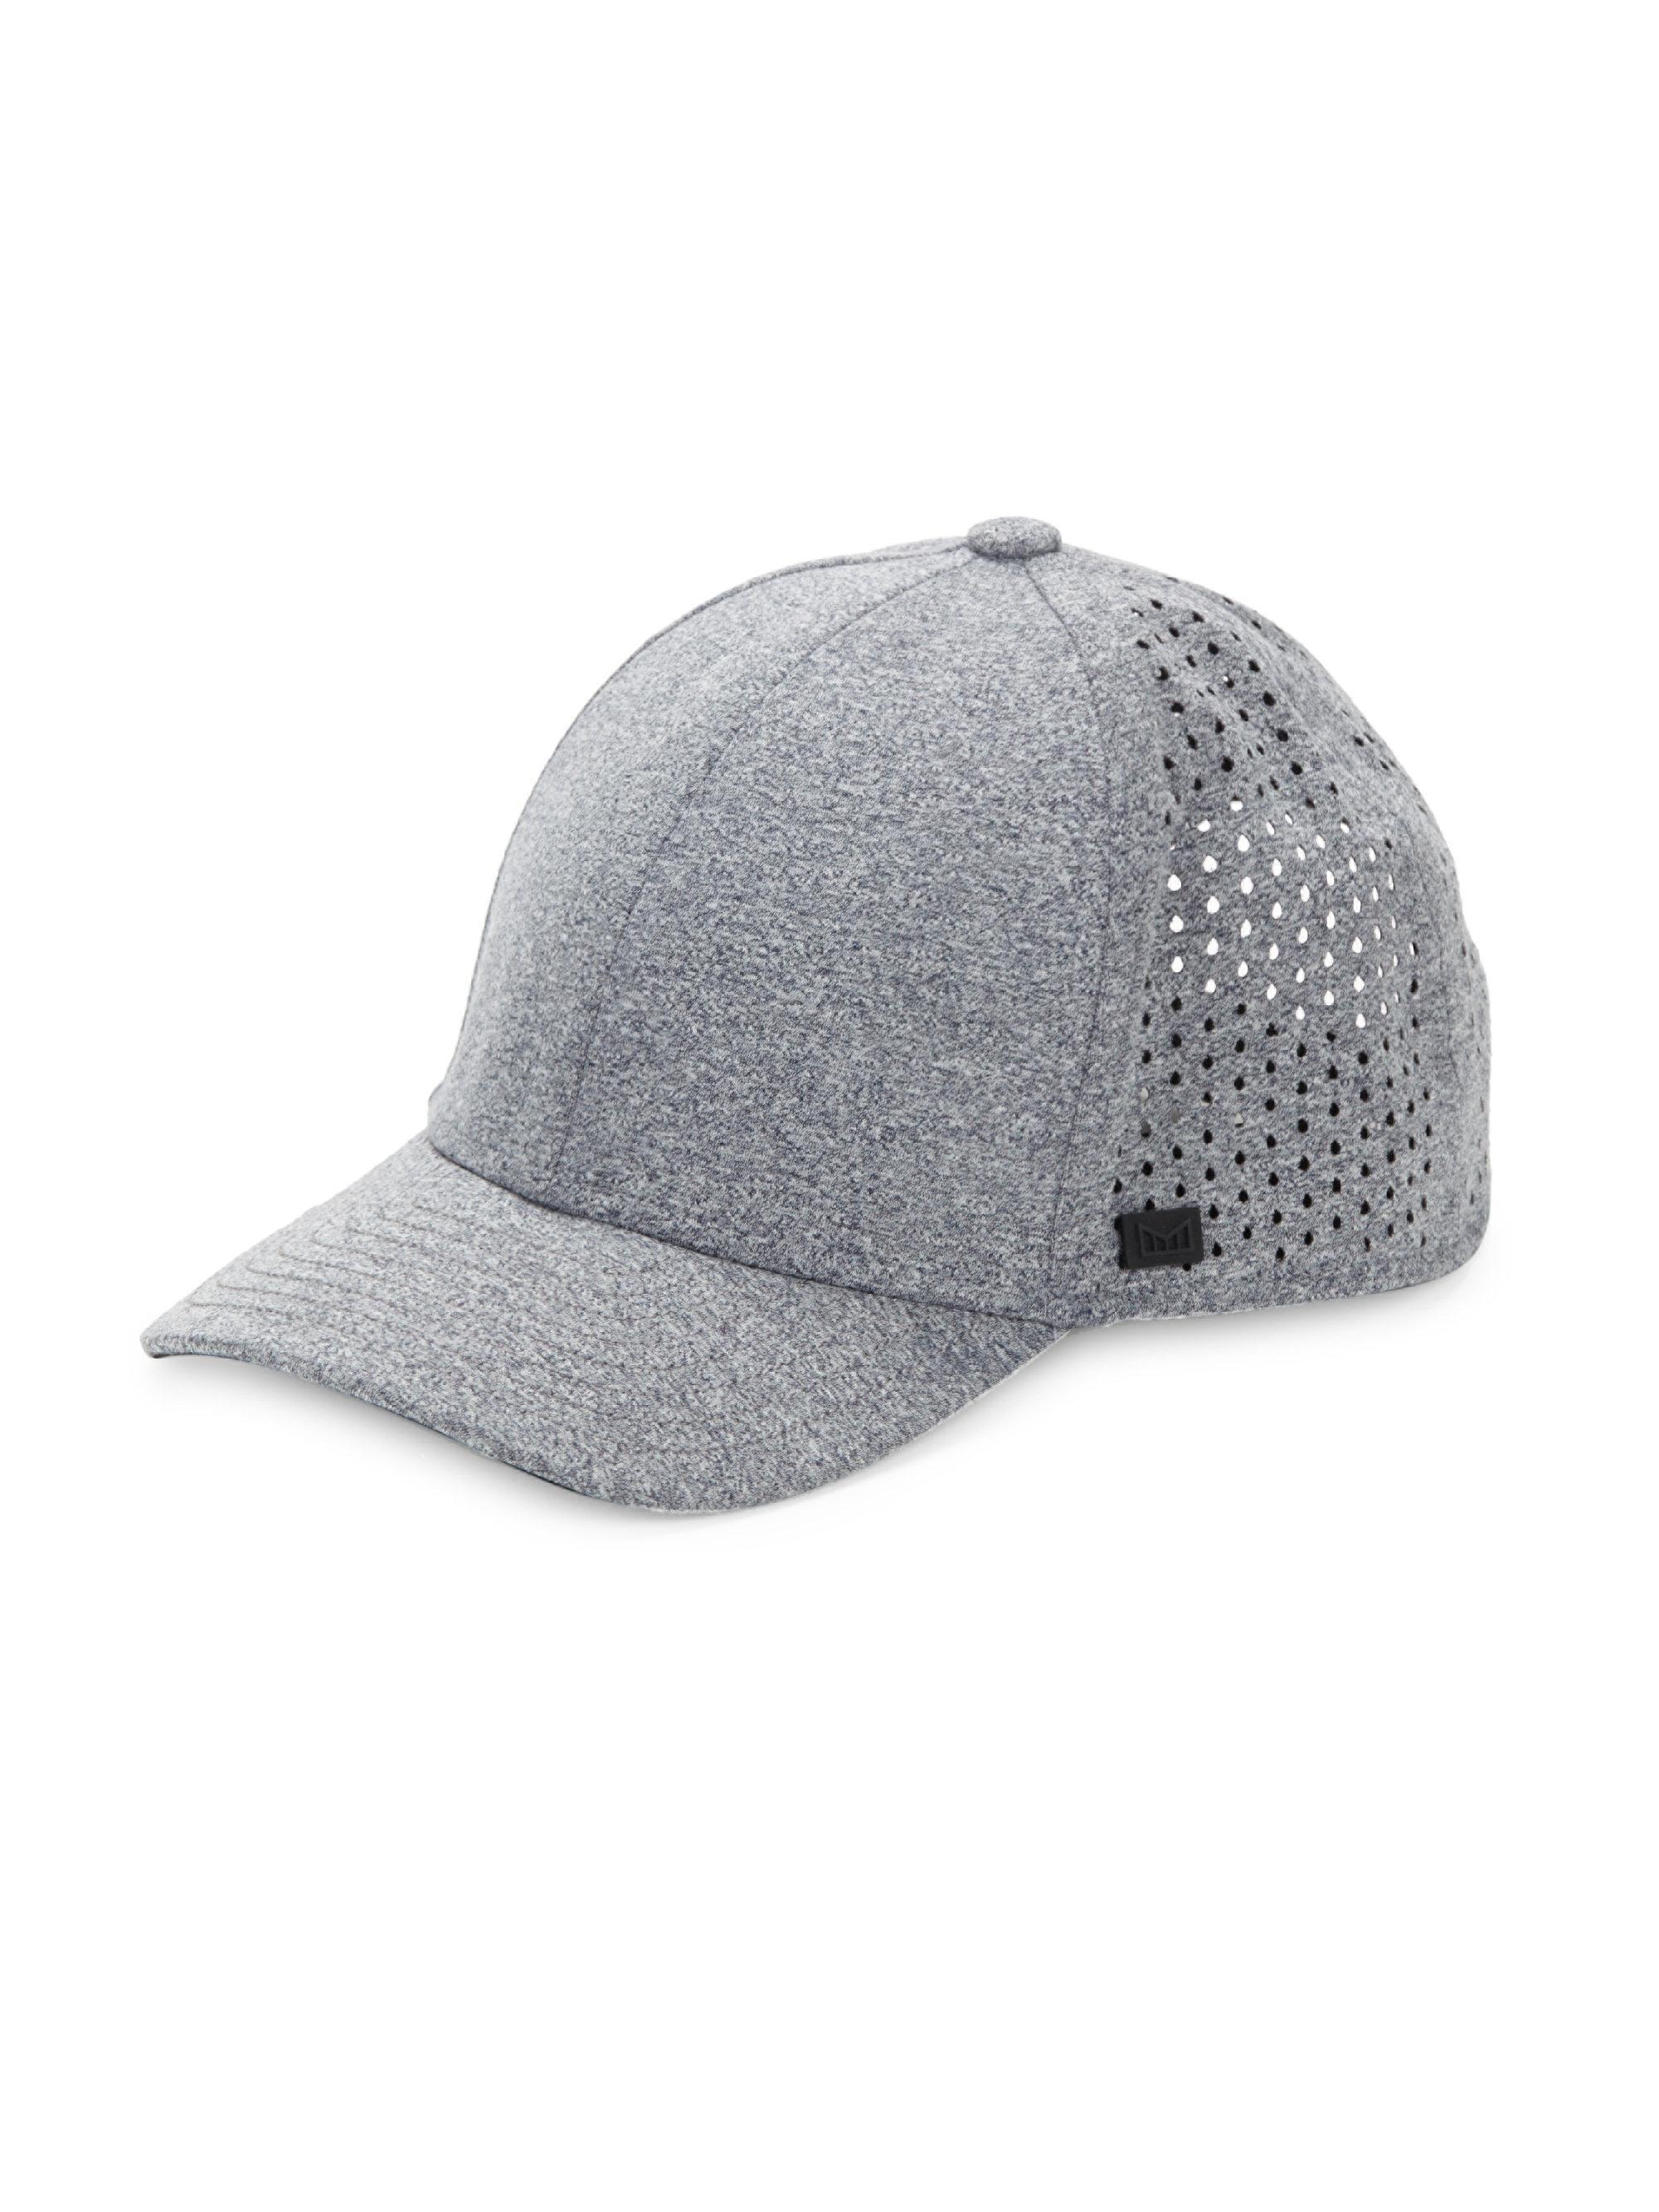 brand new b6b12 d8174 ... discount melin the a game baseball cap in gray for men lyst a56b0 48d5d